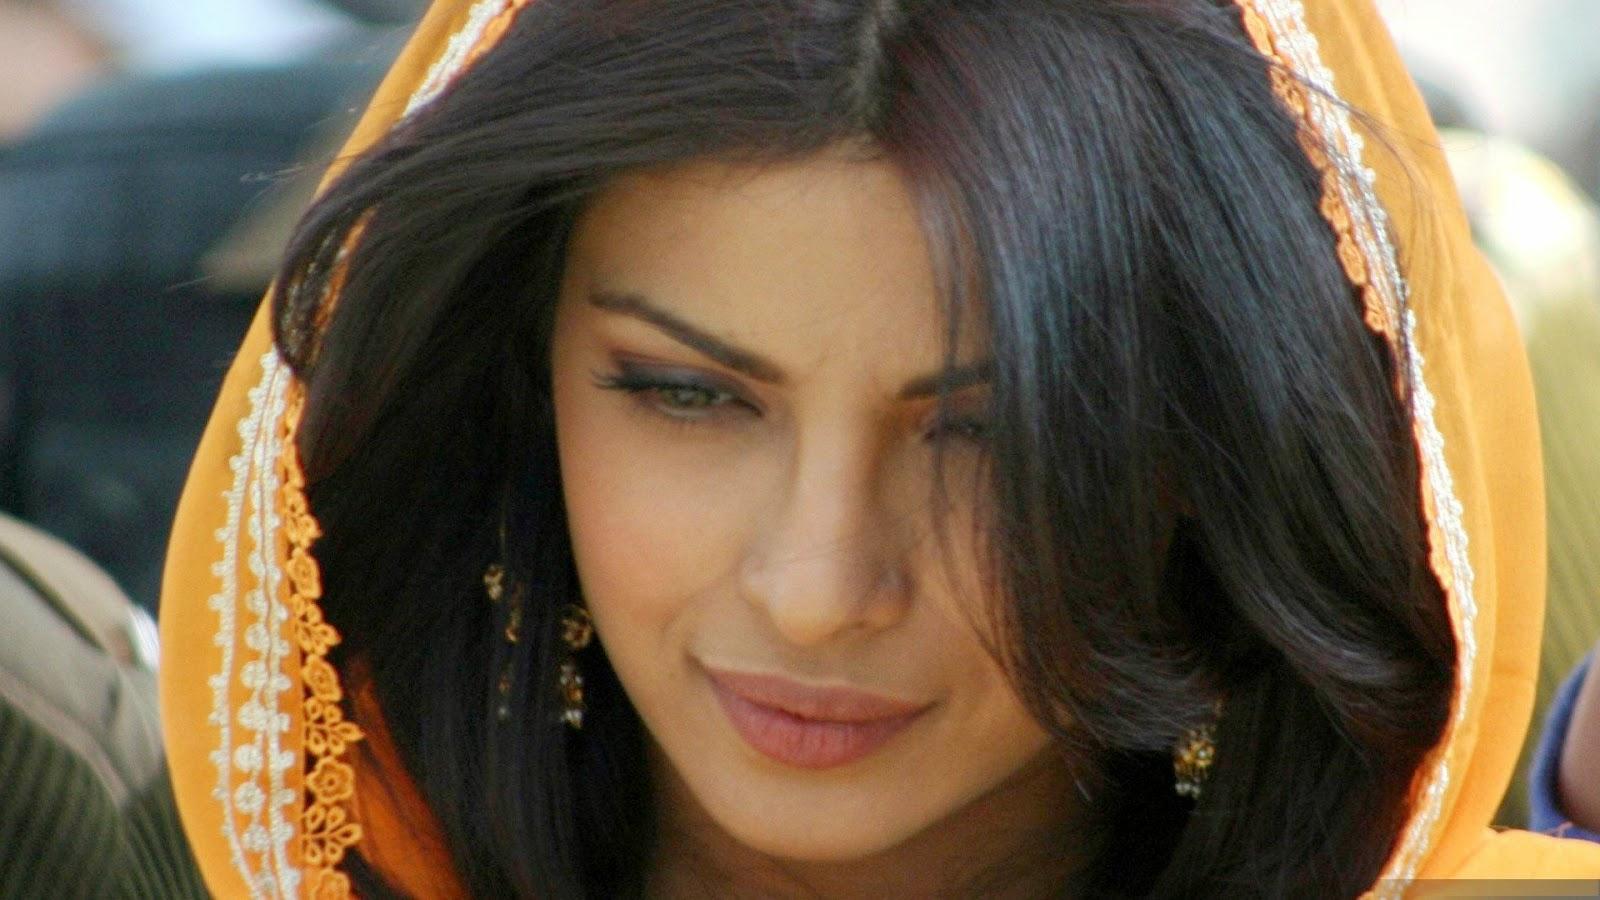 bollywood celebrity priyanka chopra, bollywood actress priyanka